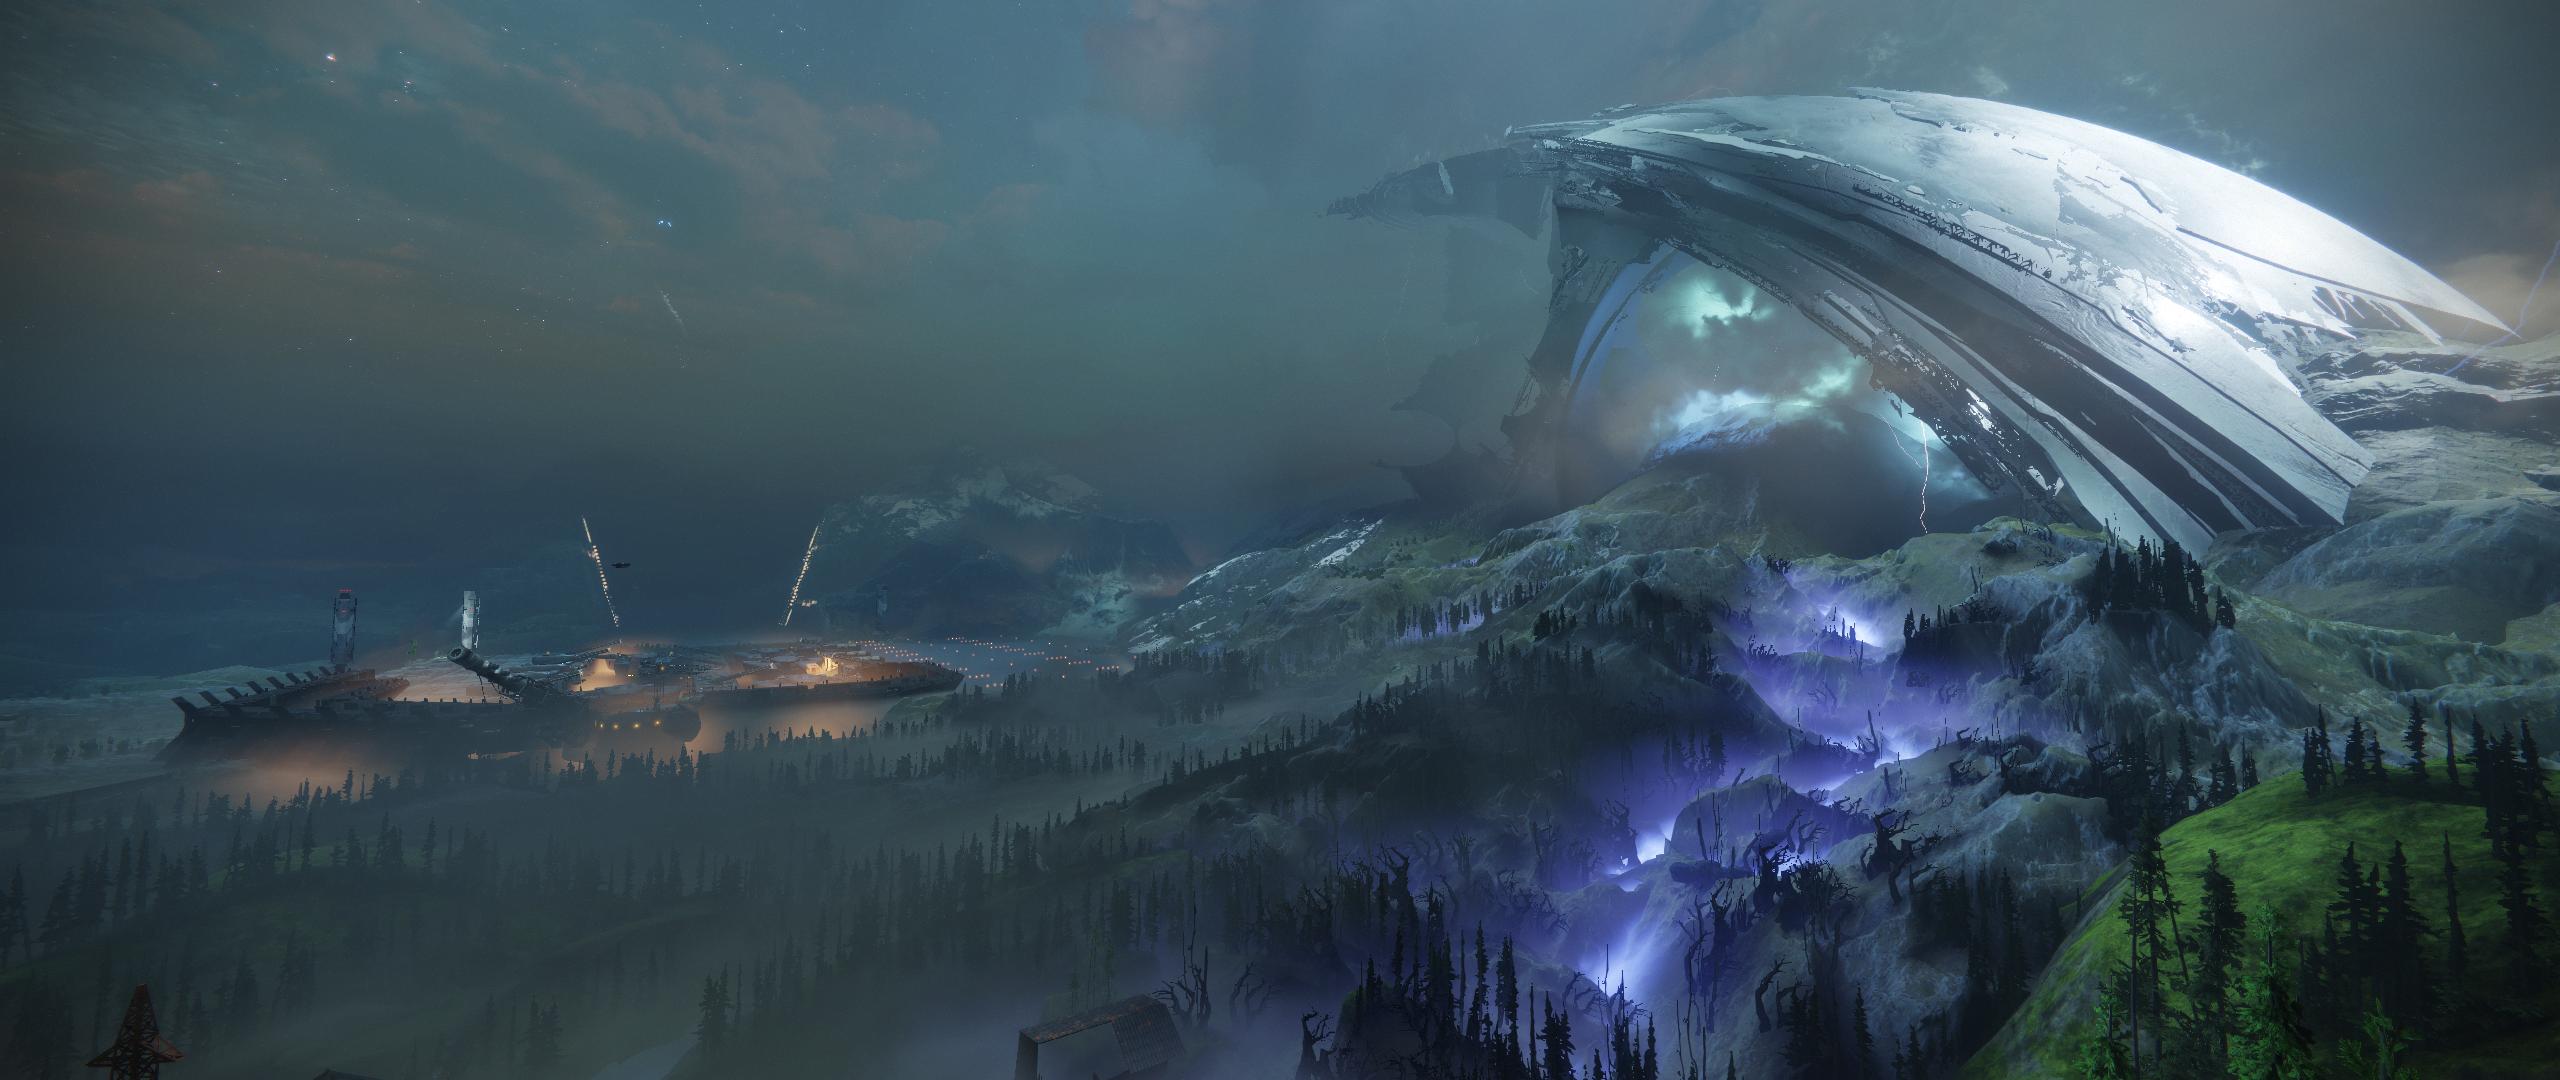 Destiny 2 Dark Shard Of The Traveler Screenshot 2560x1080 Hd Wallpaper Destiny Dark